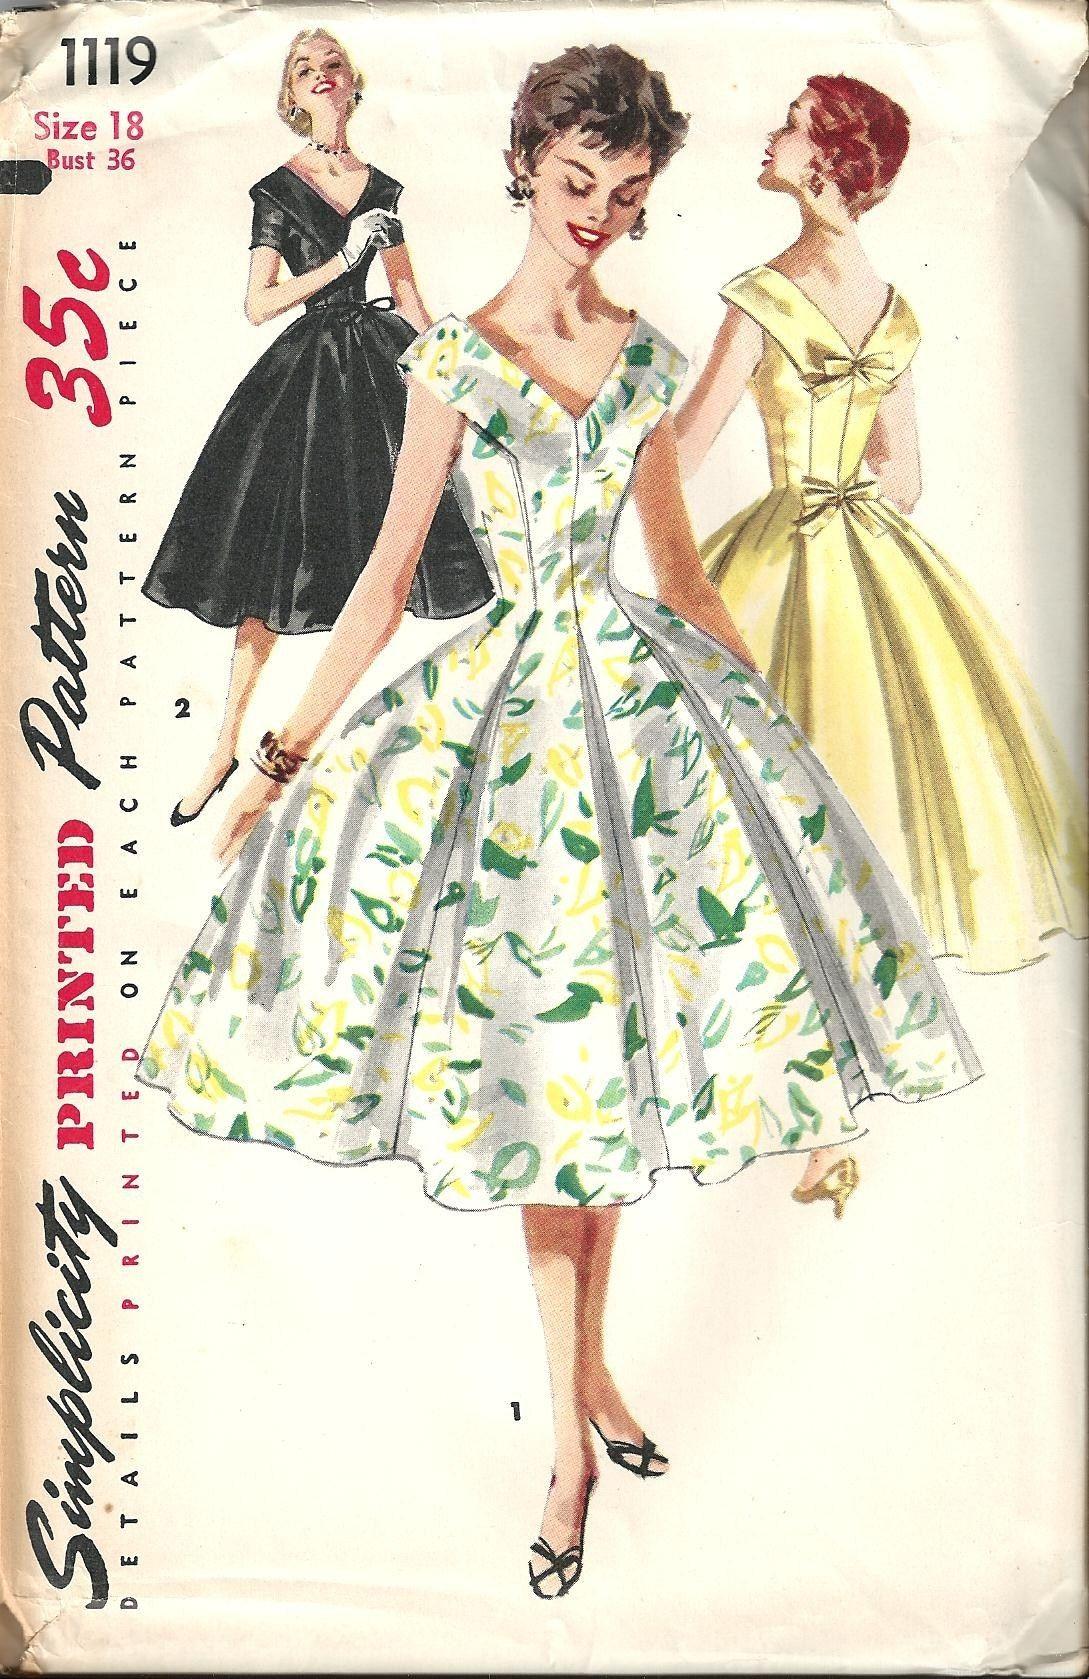 Old Sewing Patterns Old Fashioned Dress Patterns Libaifoundation Image Fashion Figswoodfiredbistro Com Vintage Dress Patterns Simplicity Patterns Dresses Party Dress Patterns